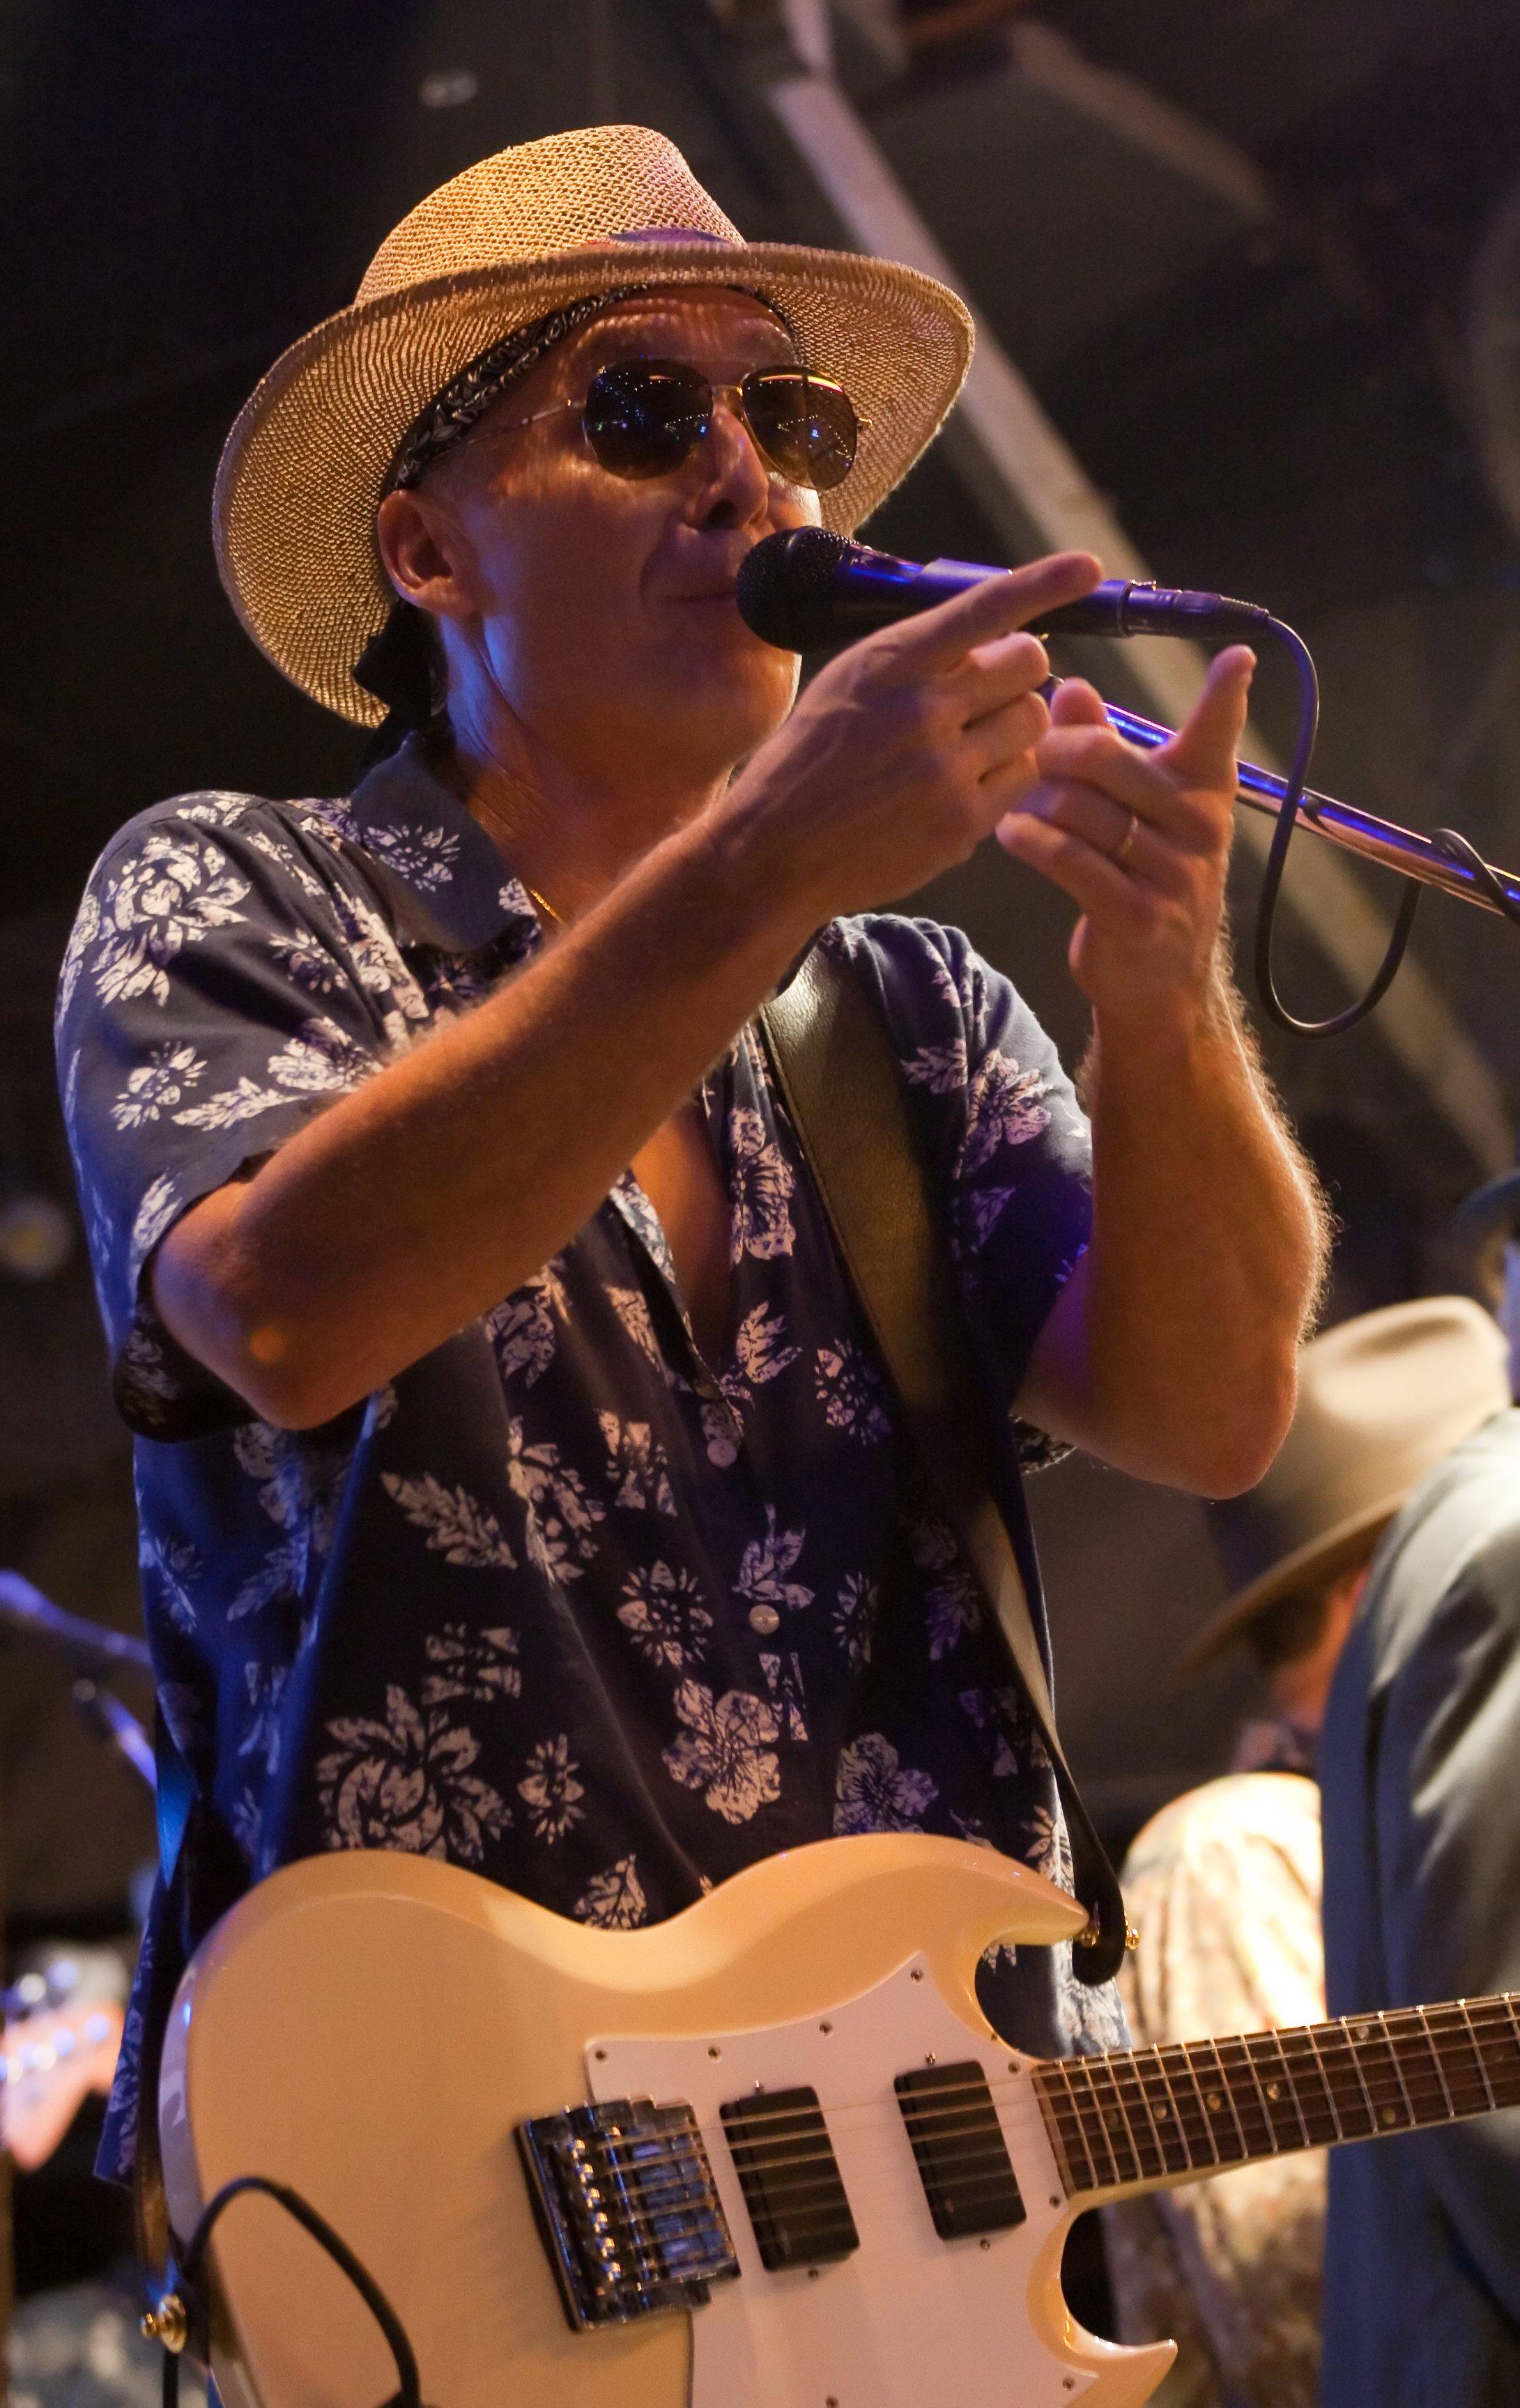 David Bley Singing